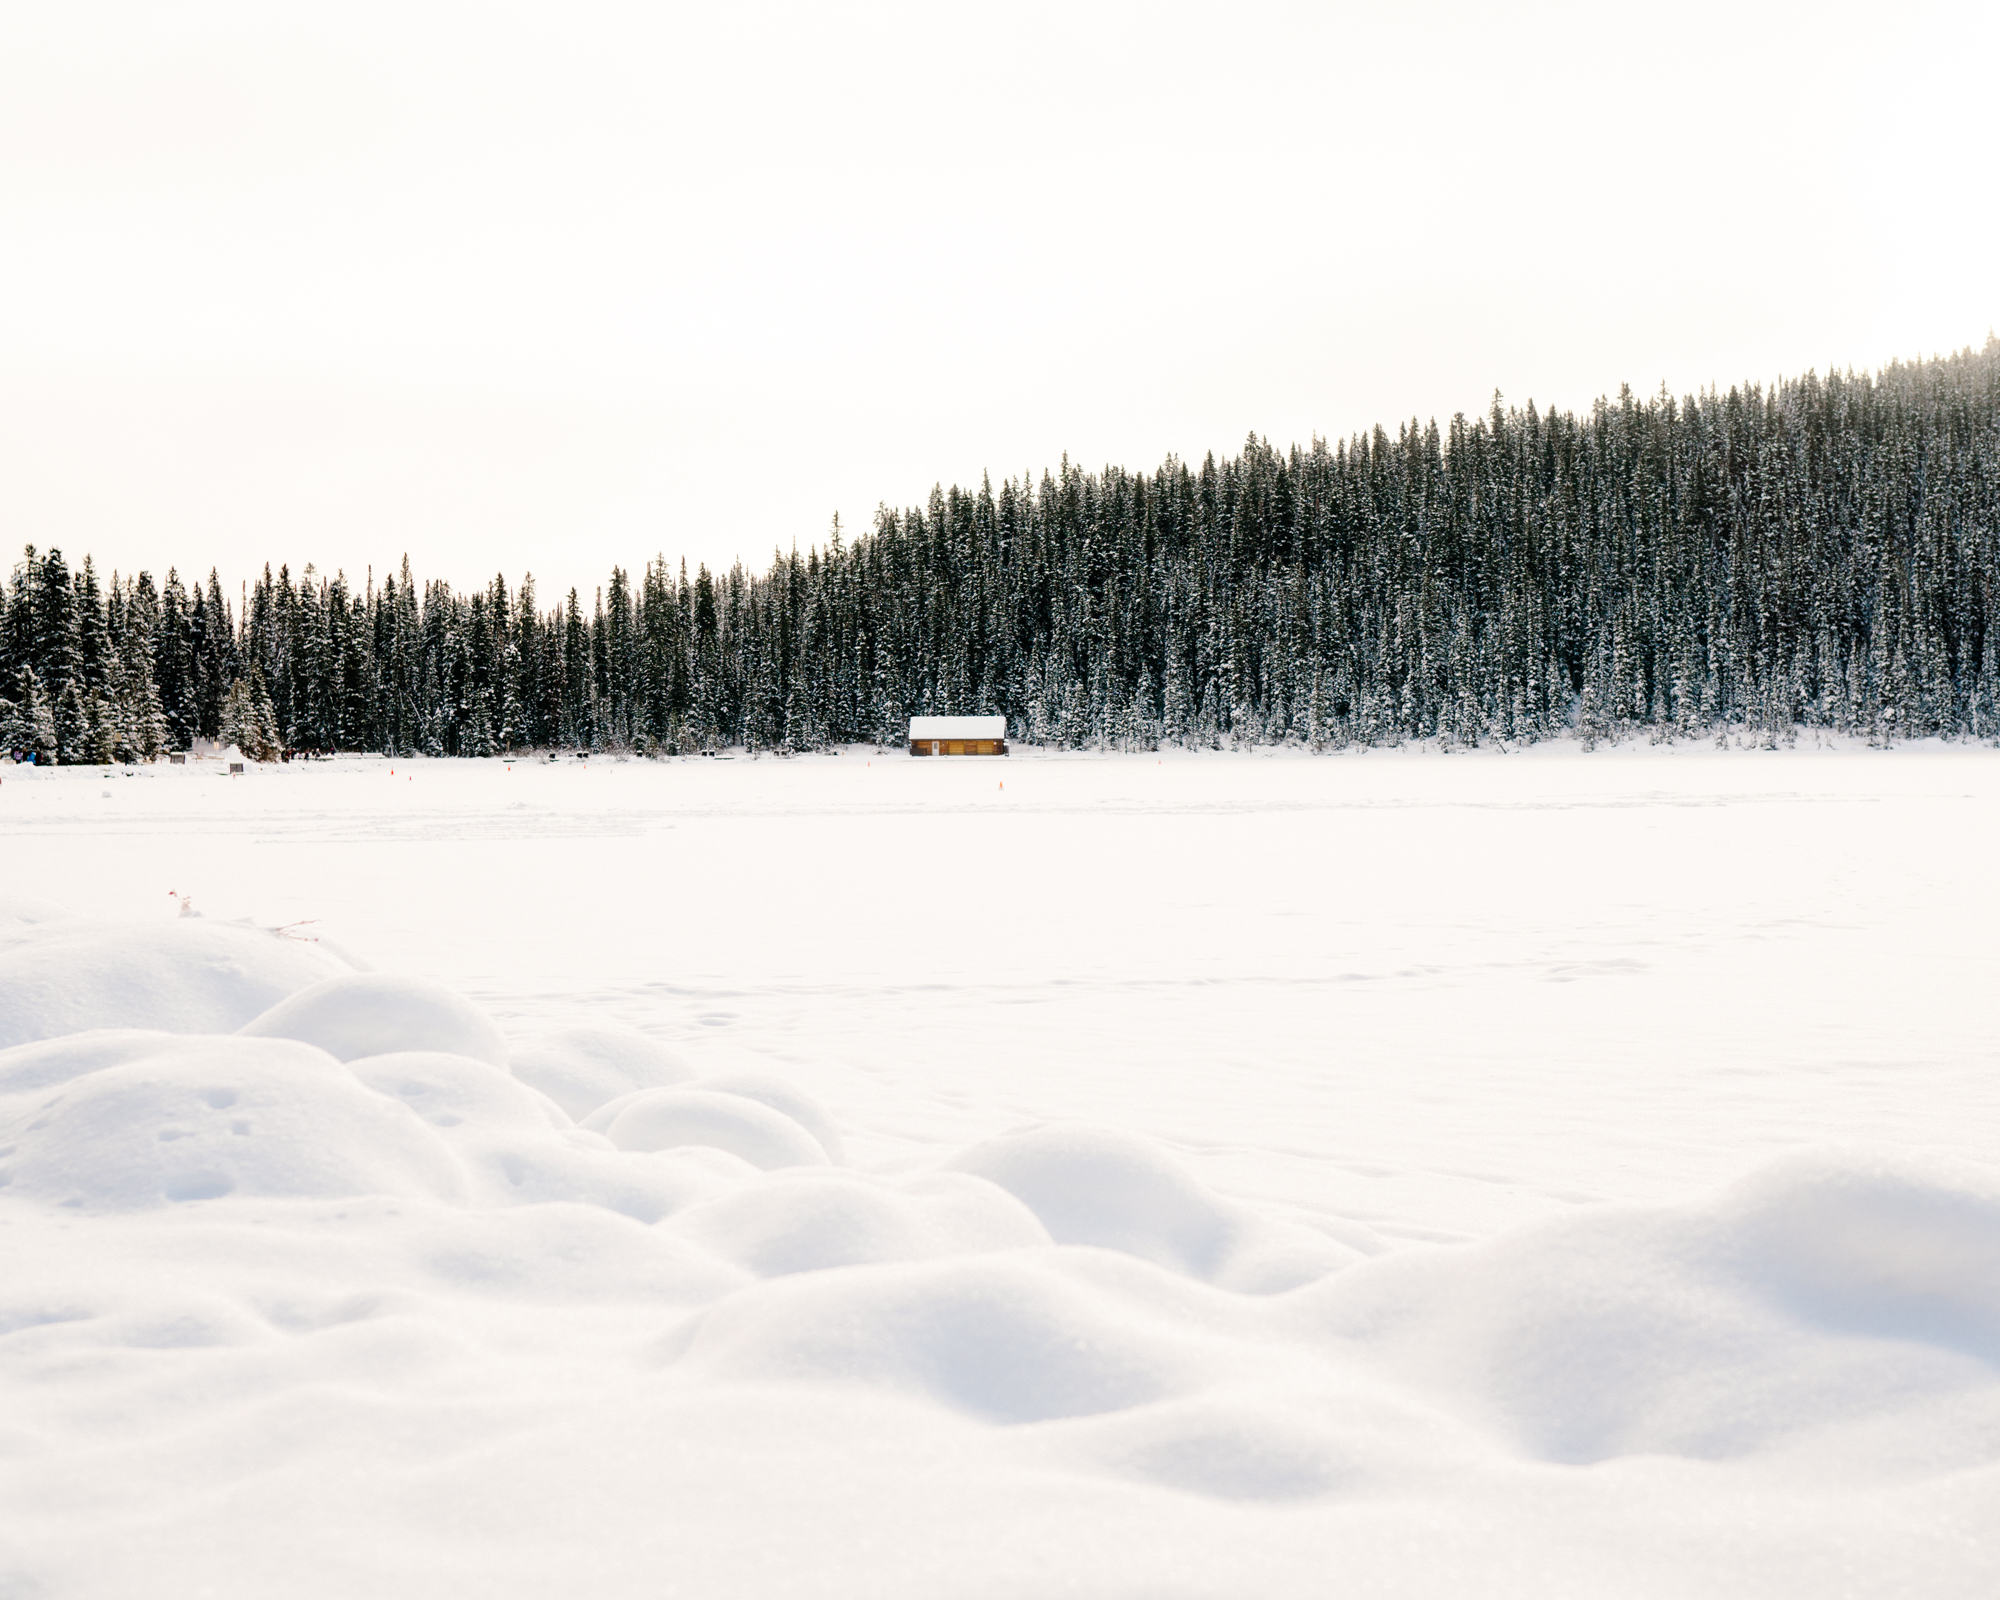 The cabin at Lake Louise